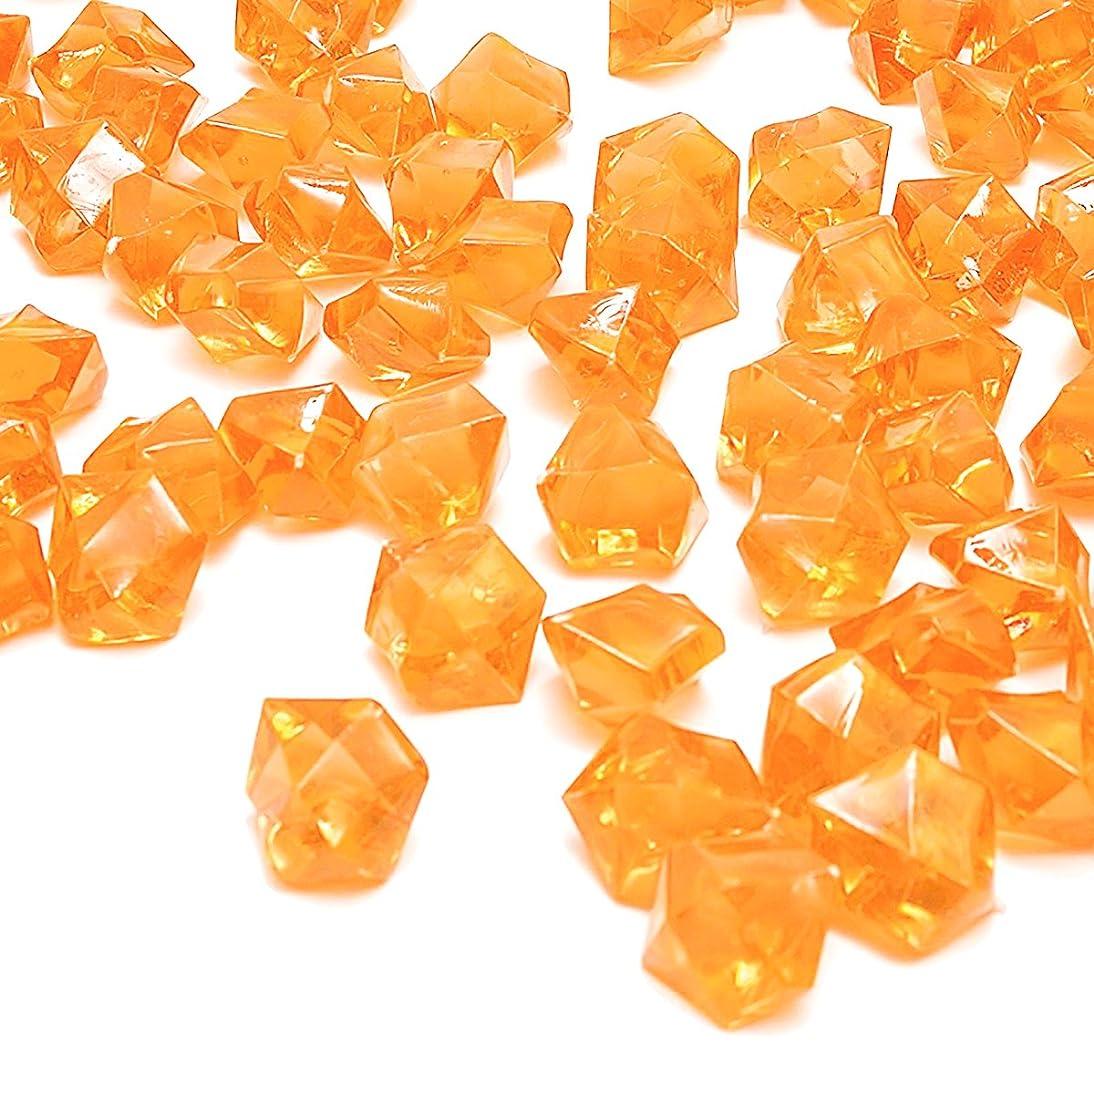 Orange Fake Crushed Ice Rocks, 150 PCS Fake Diamonds Plastic Ice Cubes Acrylic Clear Ice Rock Diamond Crystals Fake Ice Cubes Gems for Home Decoration Wedding Display Vase Fillers by DomeStar